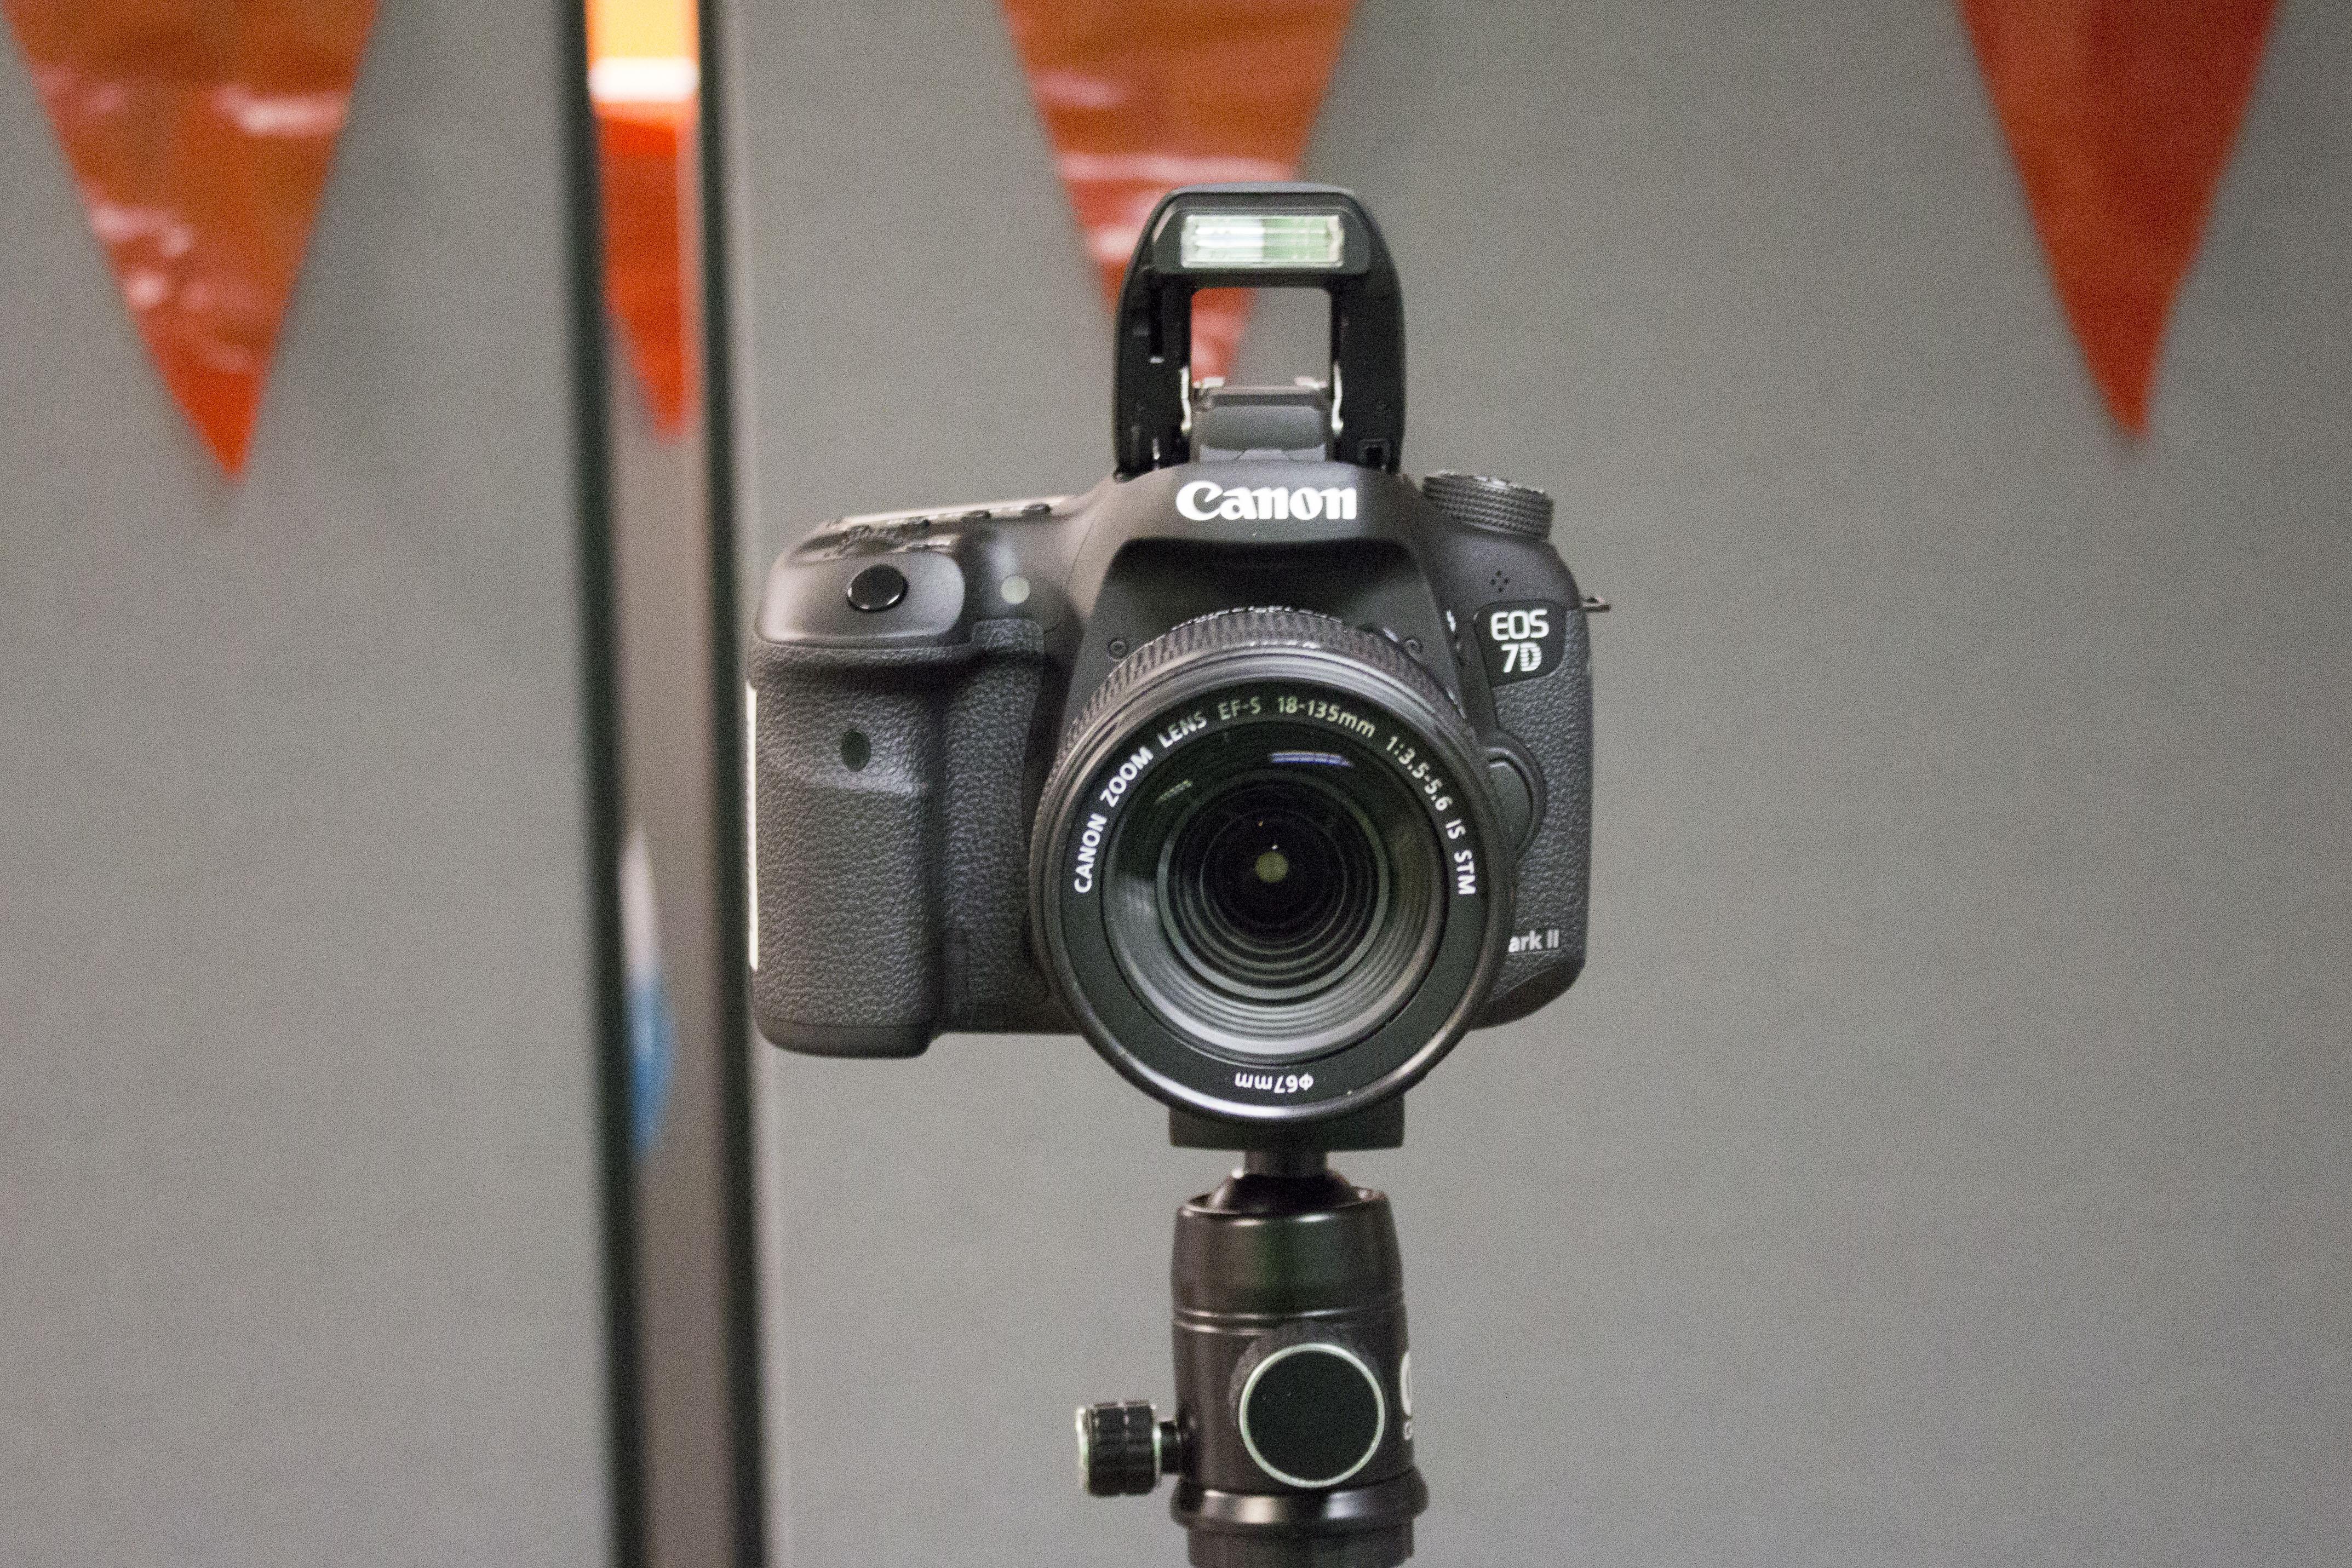 Canon EOS 7D SLR camera